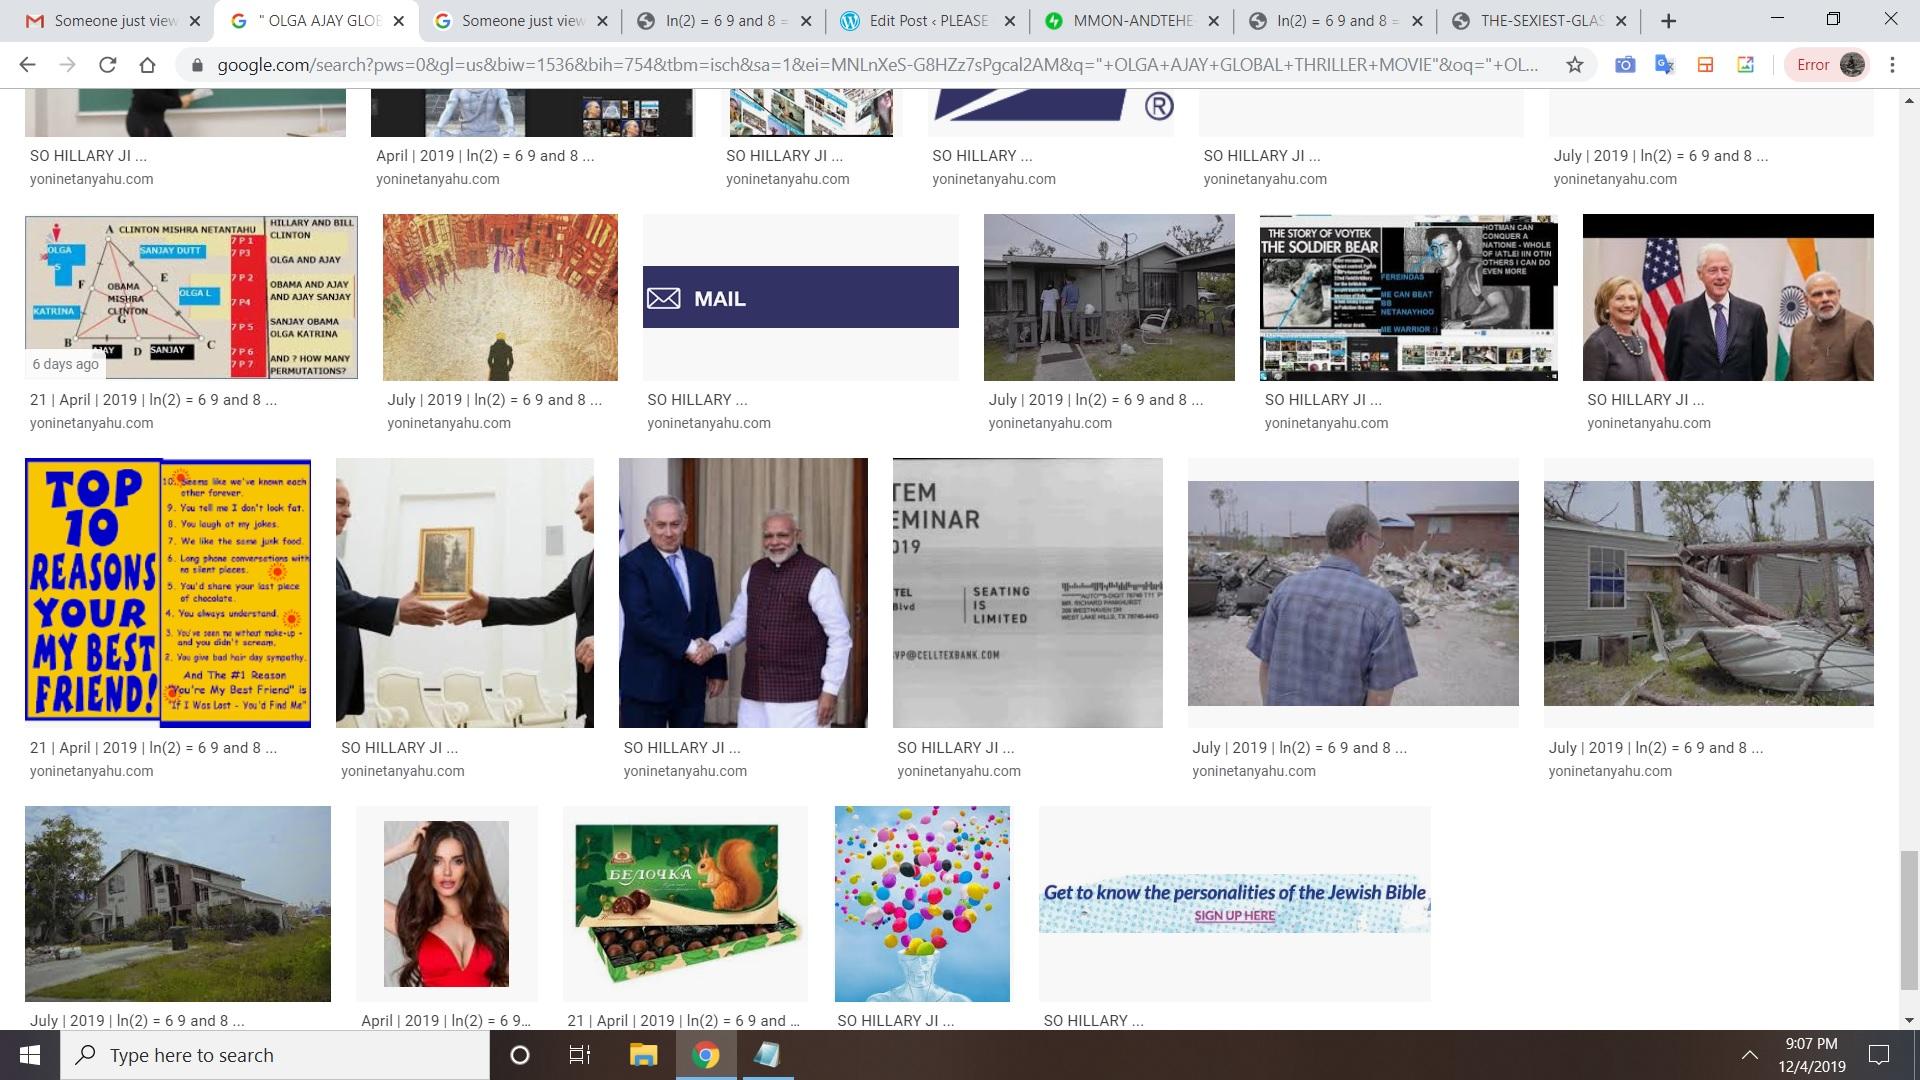 OLGA AJAY GLOBAL THRILLER MOVIE ----REGARDS HOTMAN SEE THSIE - Copy